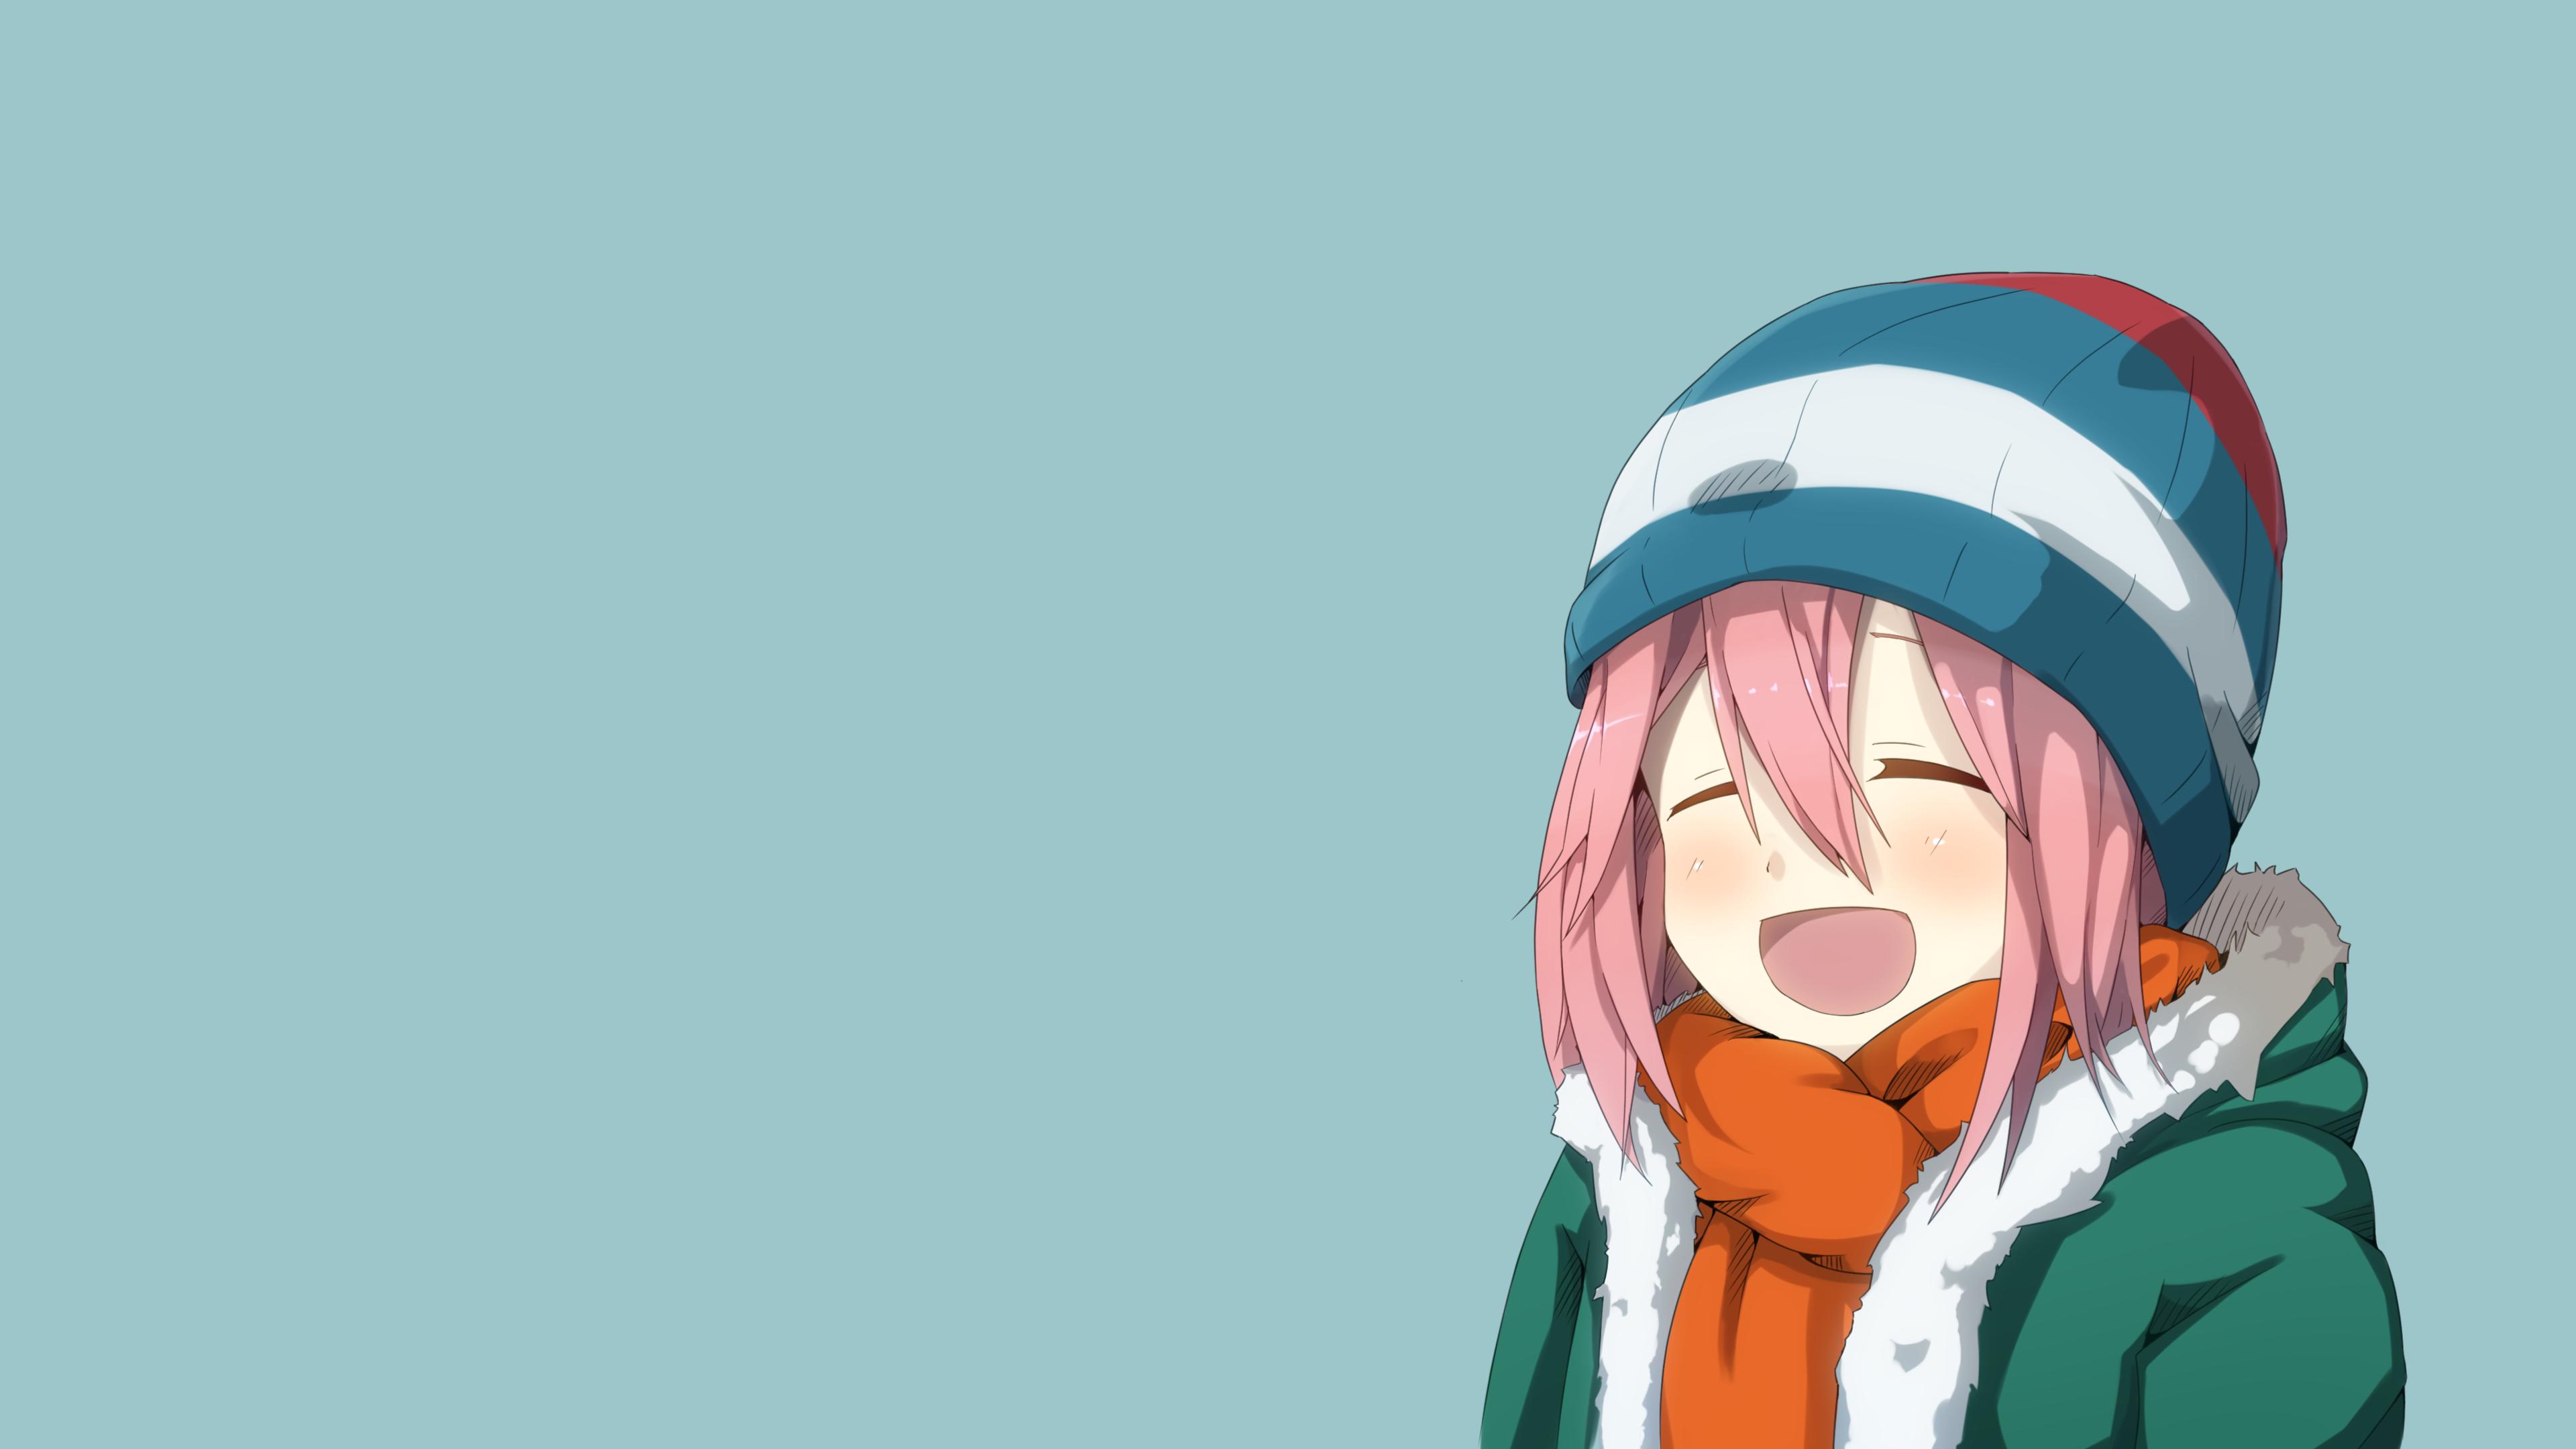 Anime simple background nadeshiko kagamihara yuru camp 1